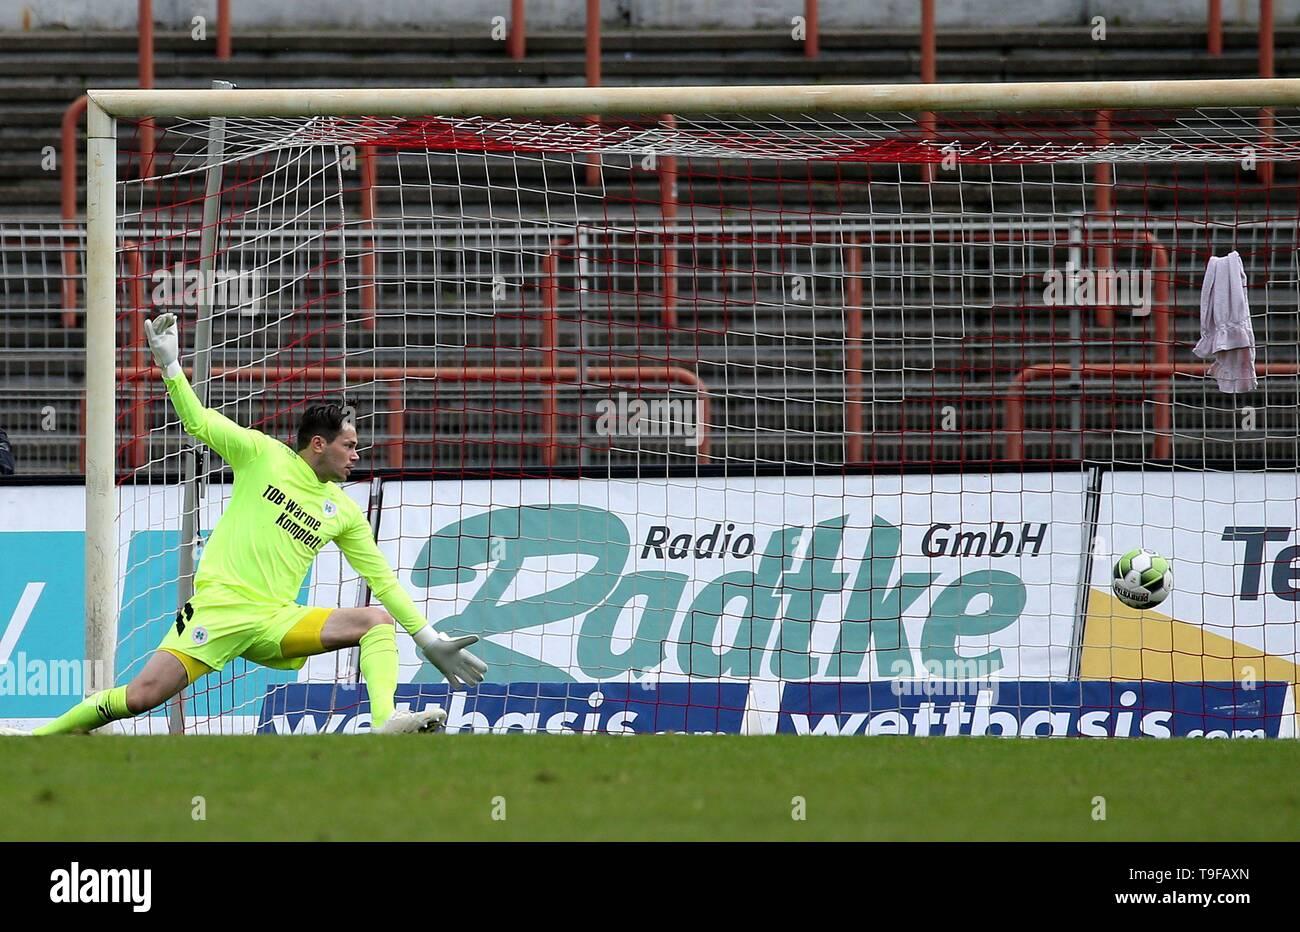 Oberhausen, Deutschland. 18th May, 2019. firo: 18.05.2019 Football, Regionalliga West, season 2018/2019 Rot-Weiss Oberhausen - SC Verl goalkeeper Daniel Davari (# 31, Red-Weiss Oberhausen) can not parry the ball to 1: 3. | usage worldwide Credit: dpa/Alamy Live News - Stock Image